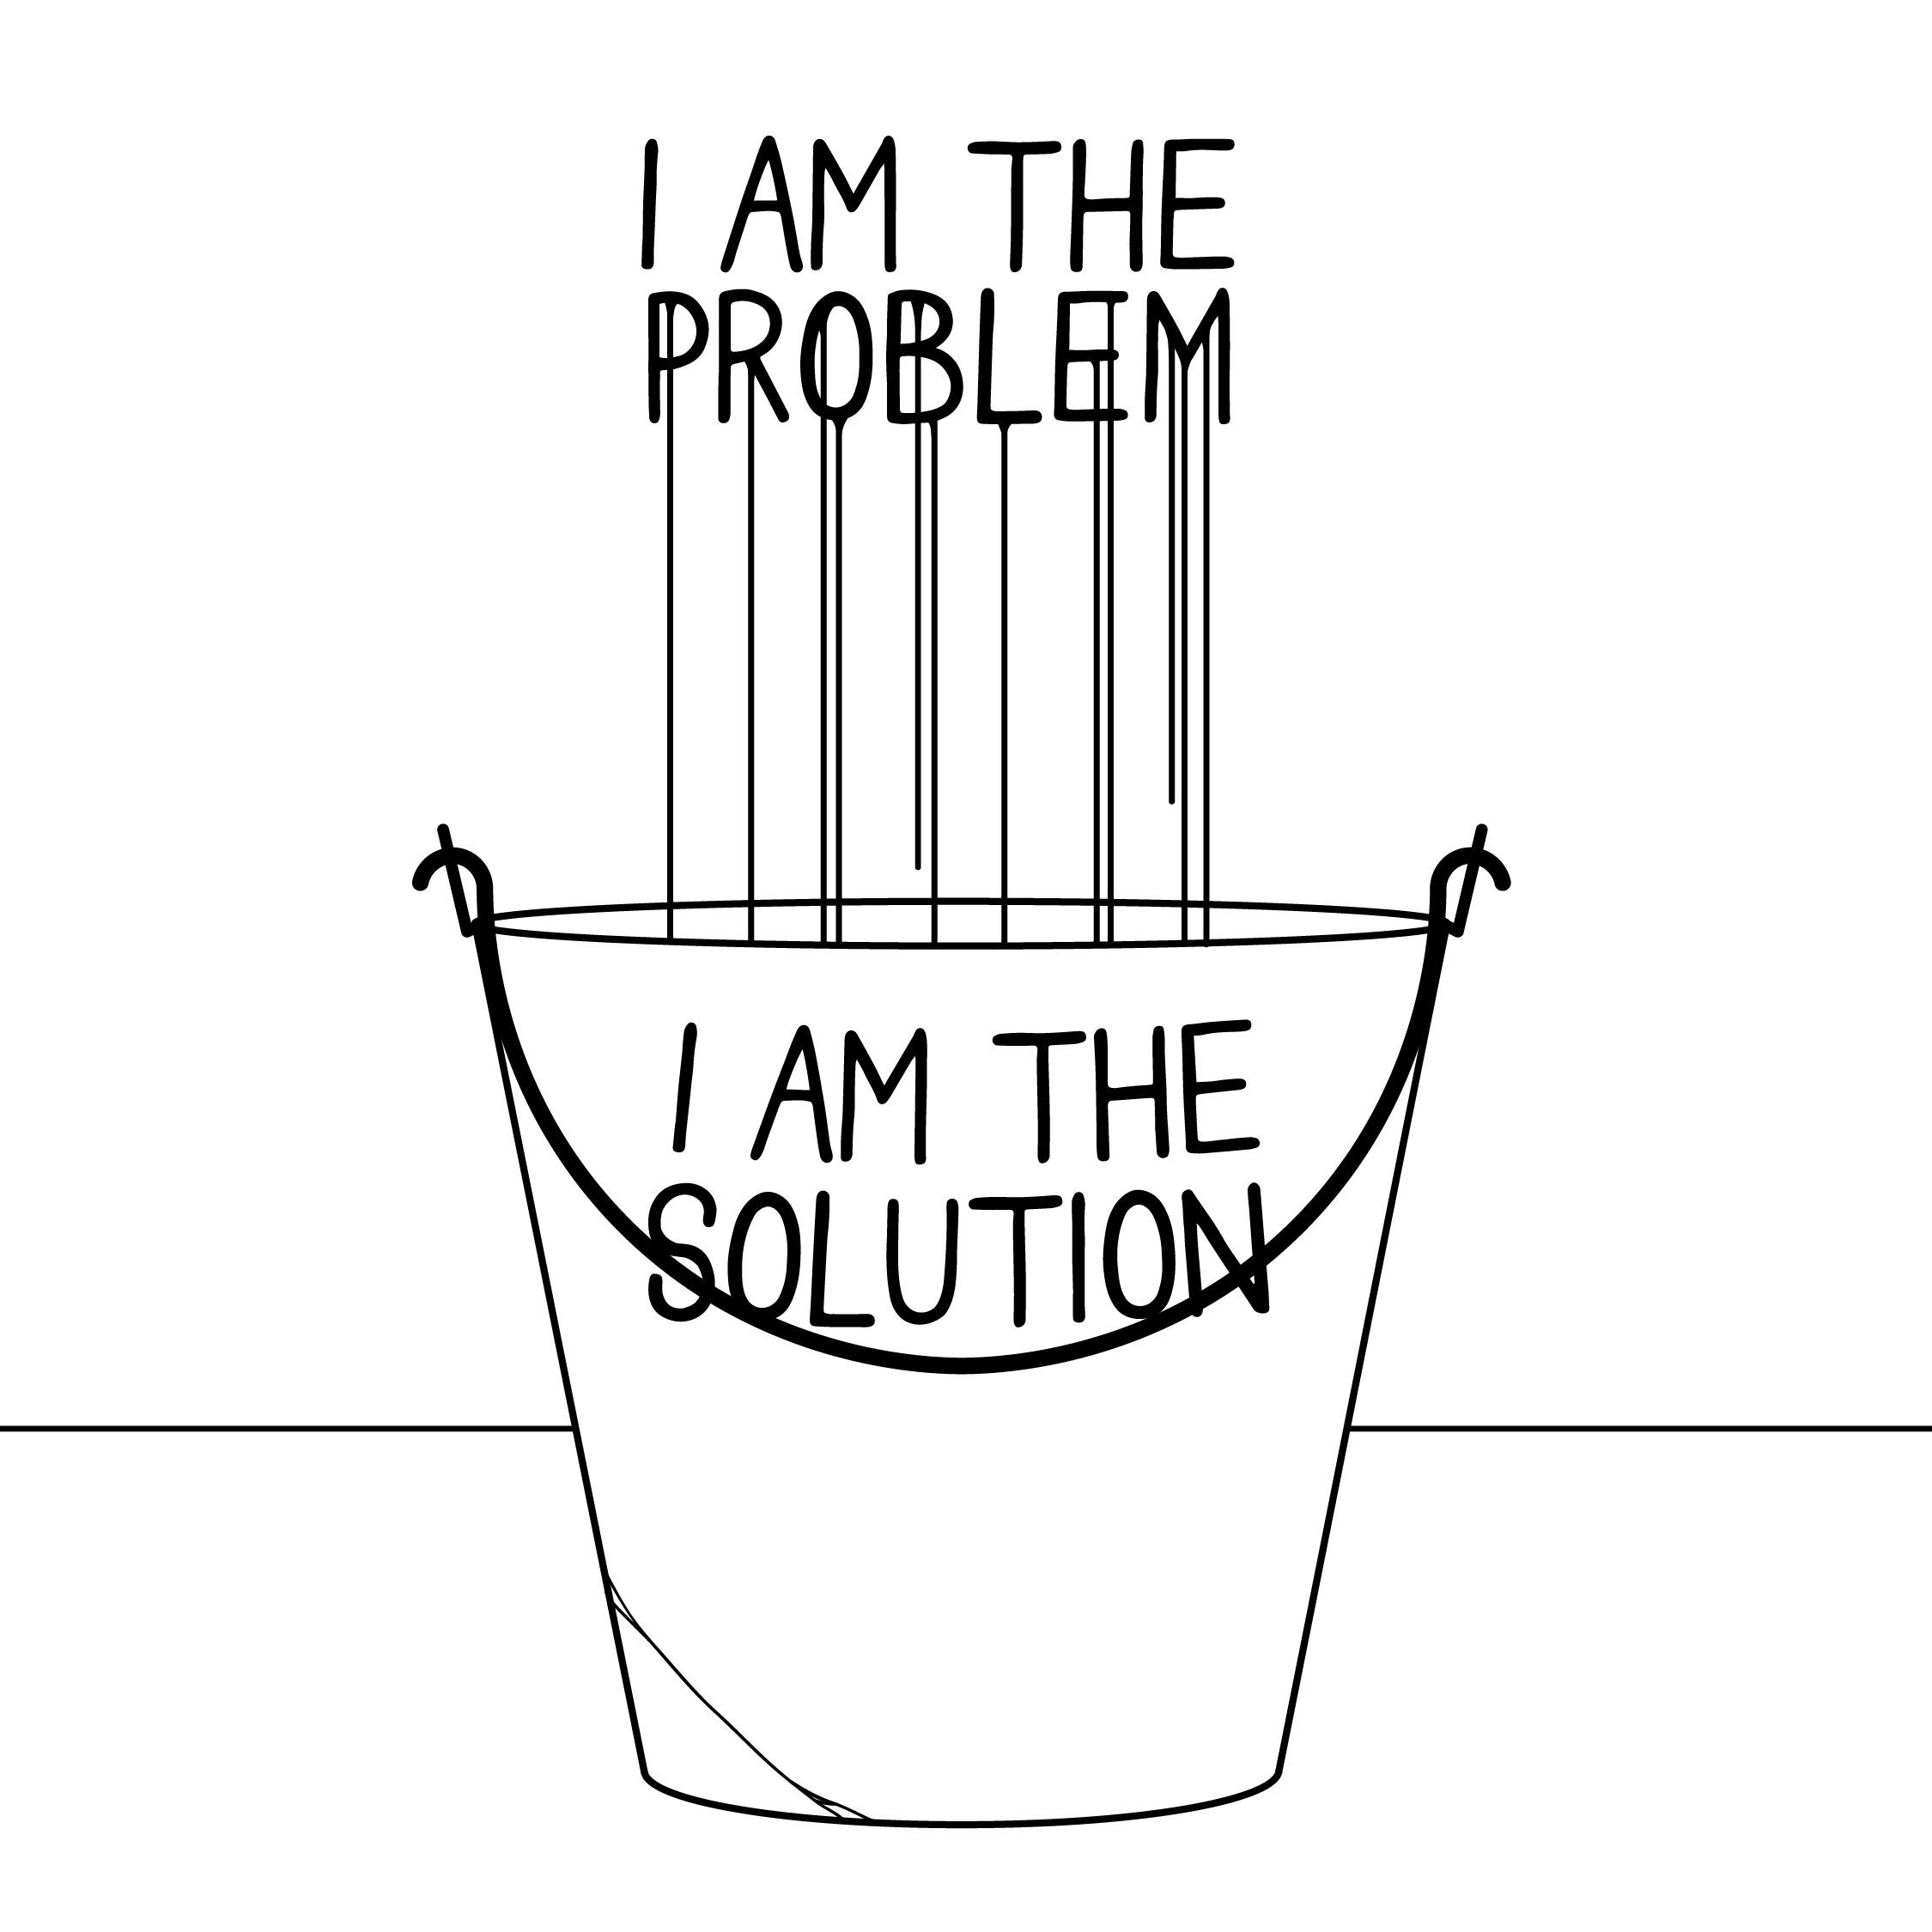 problemsolution-01.jpg